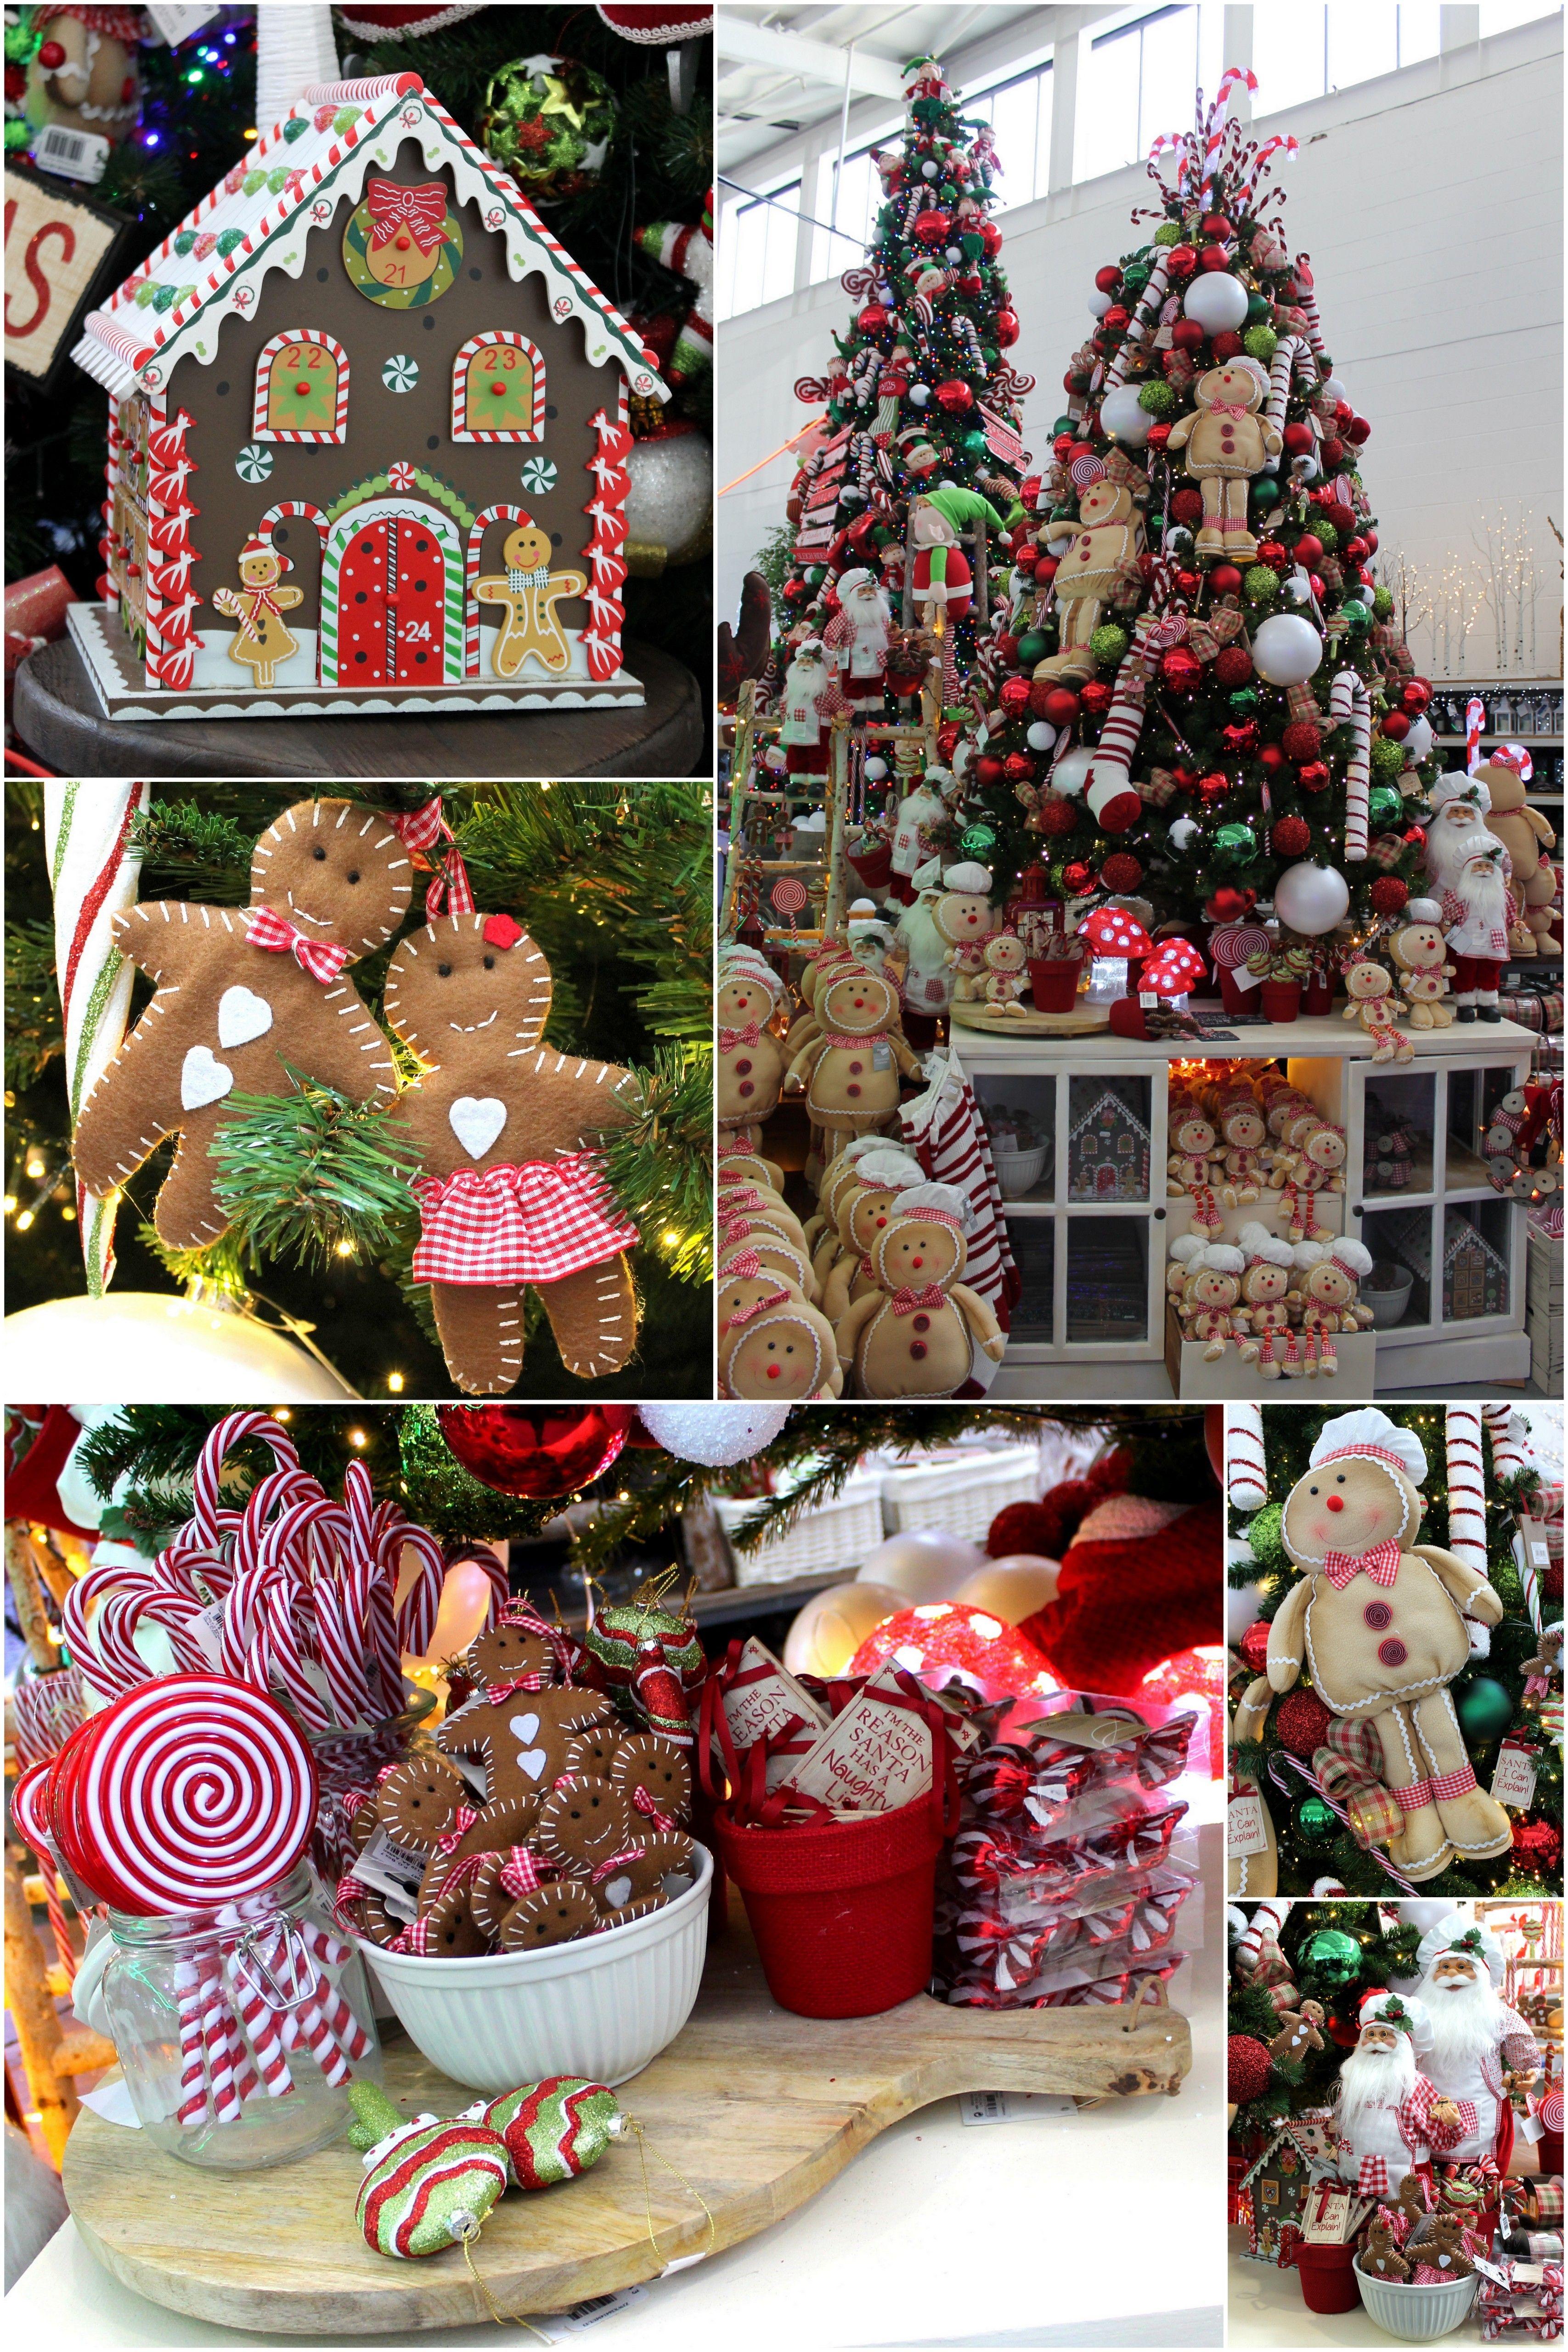 a fun christmas theme with all things gingerbread hh christmas joy 6 rh pinterest com